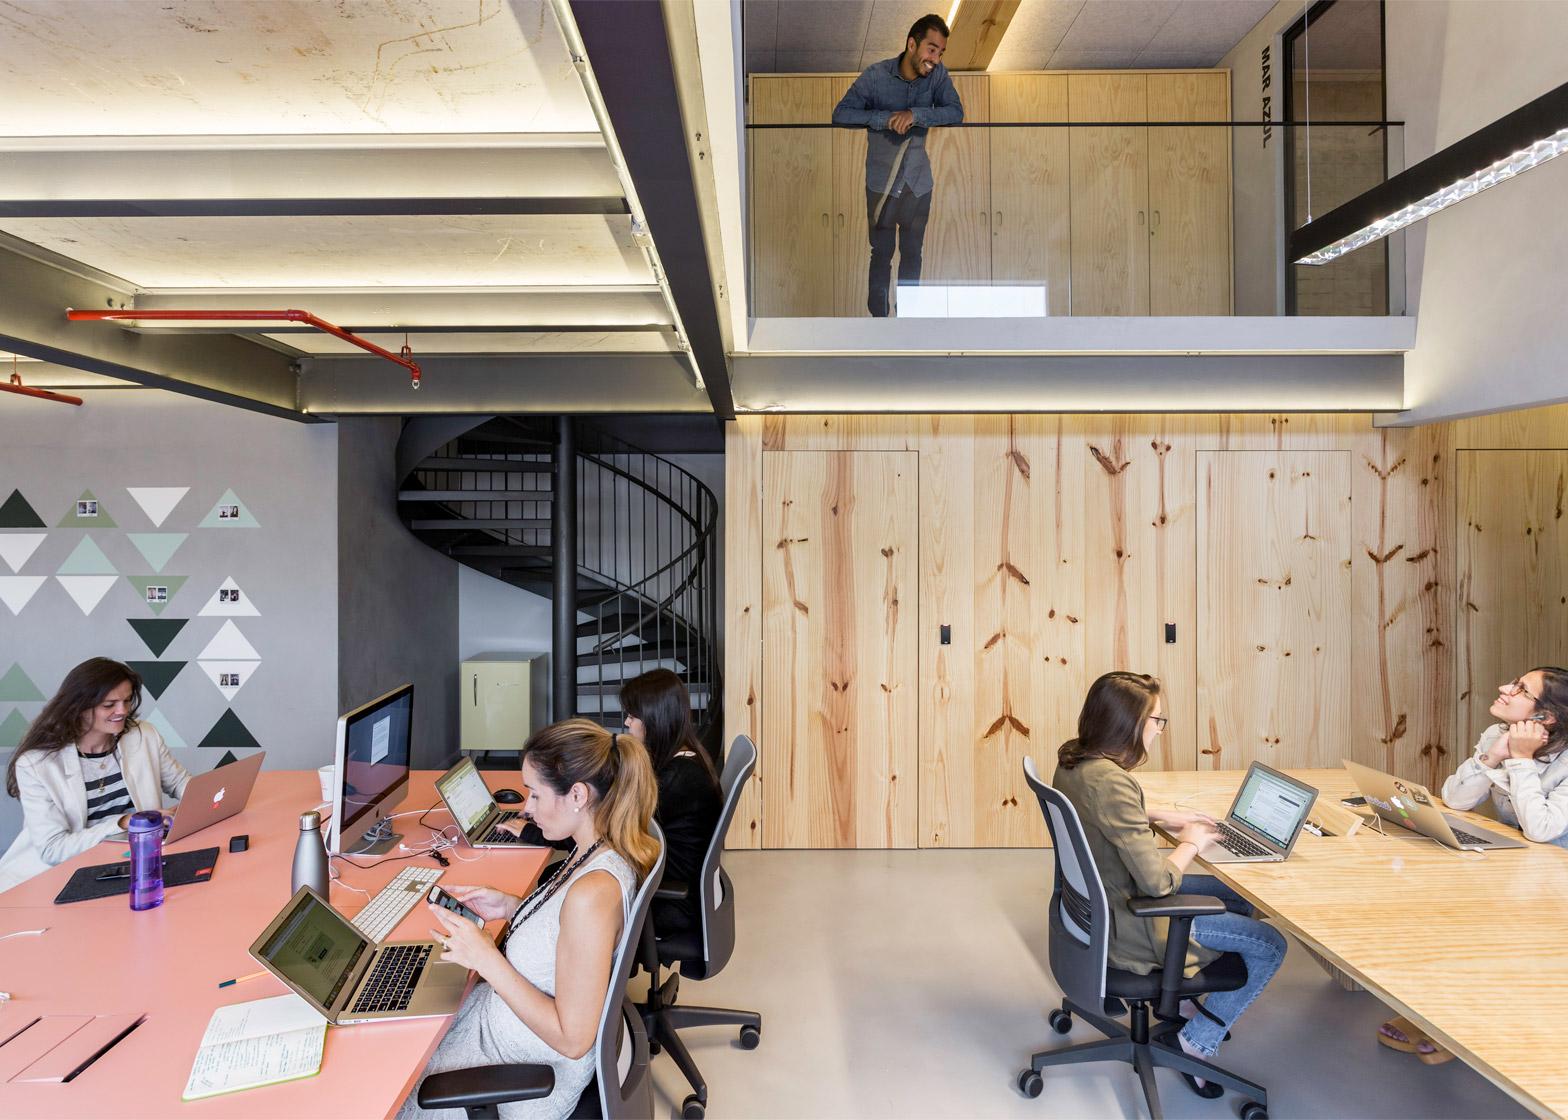 airbnb-offices_sao-paulo_mm18_dezeen_1568_8